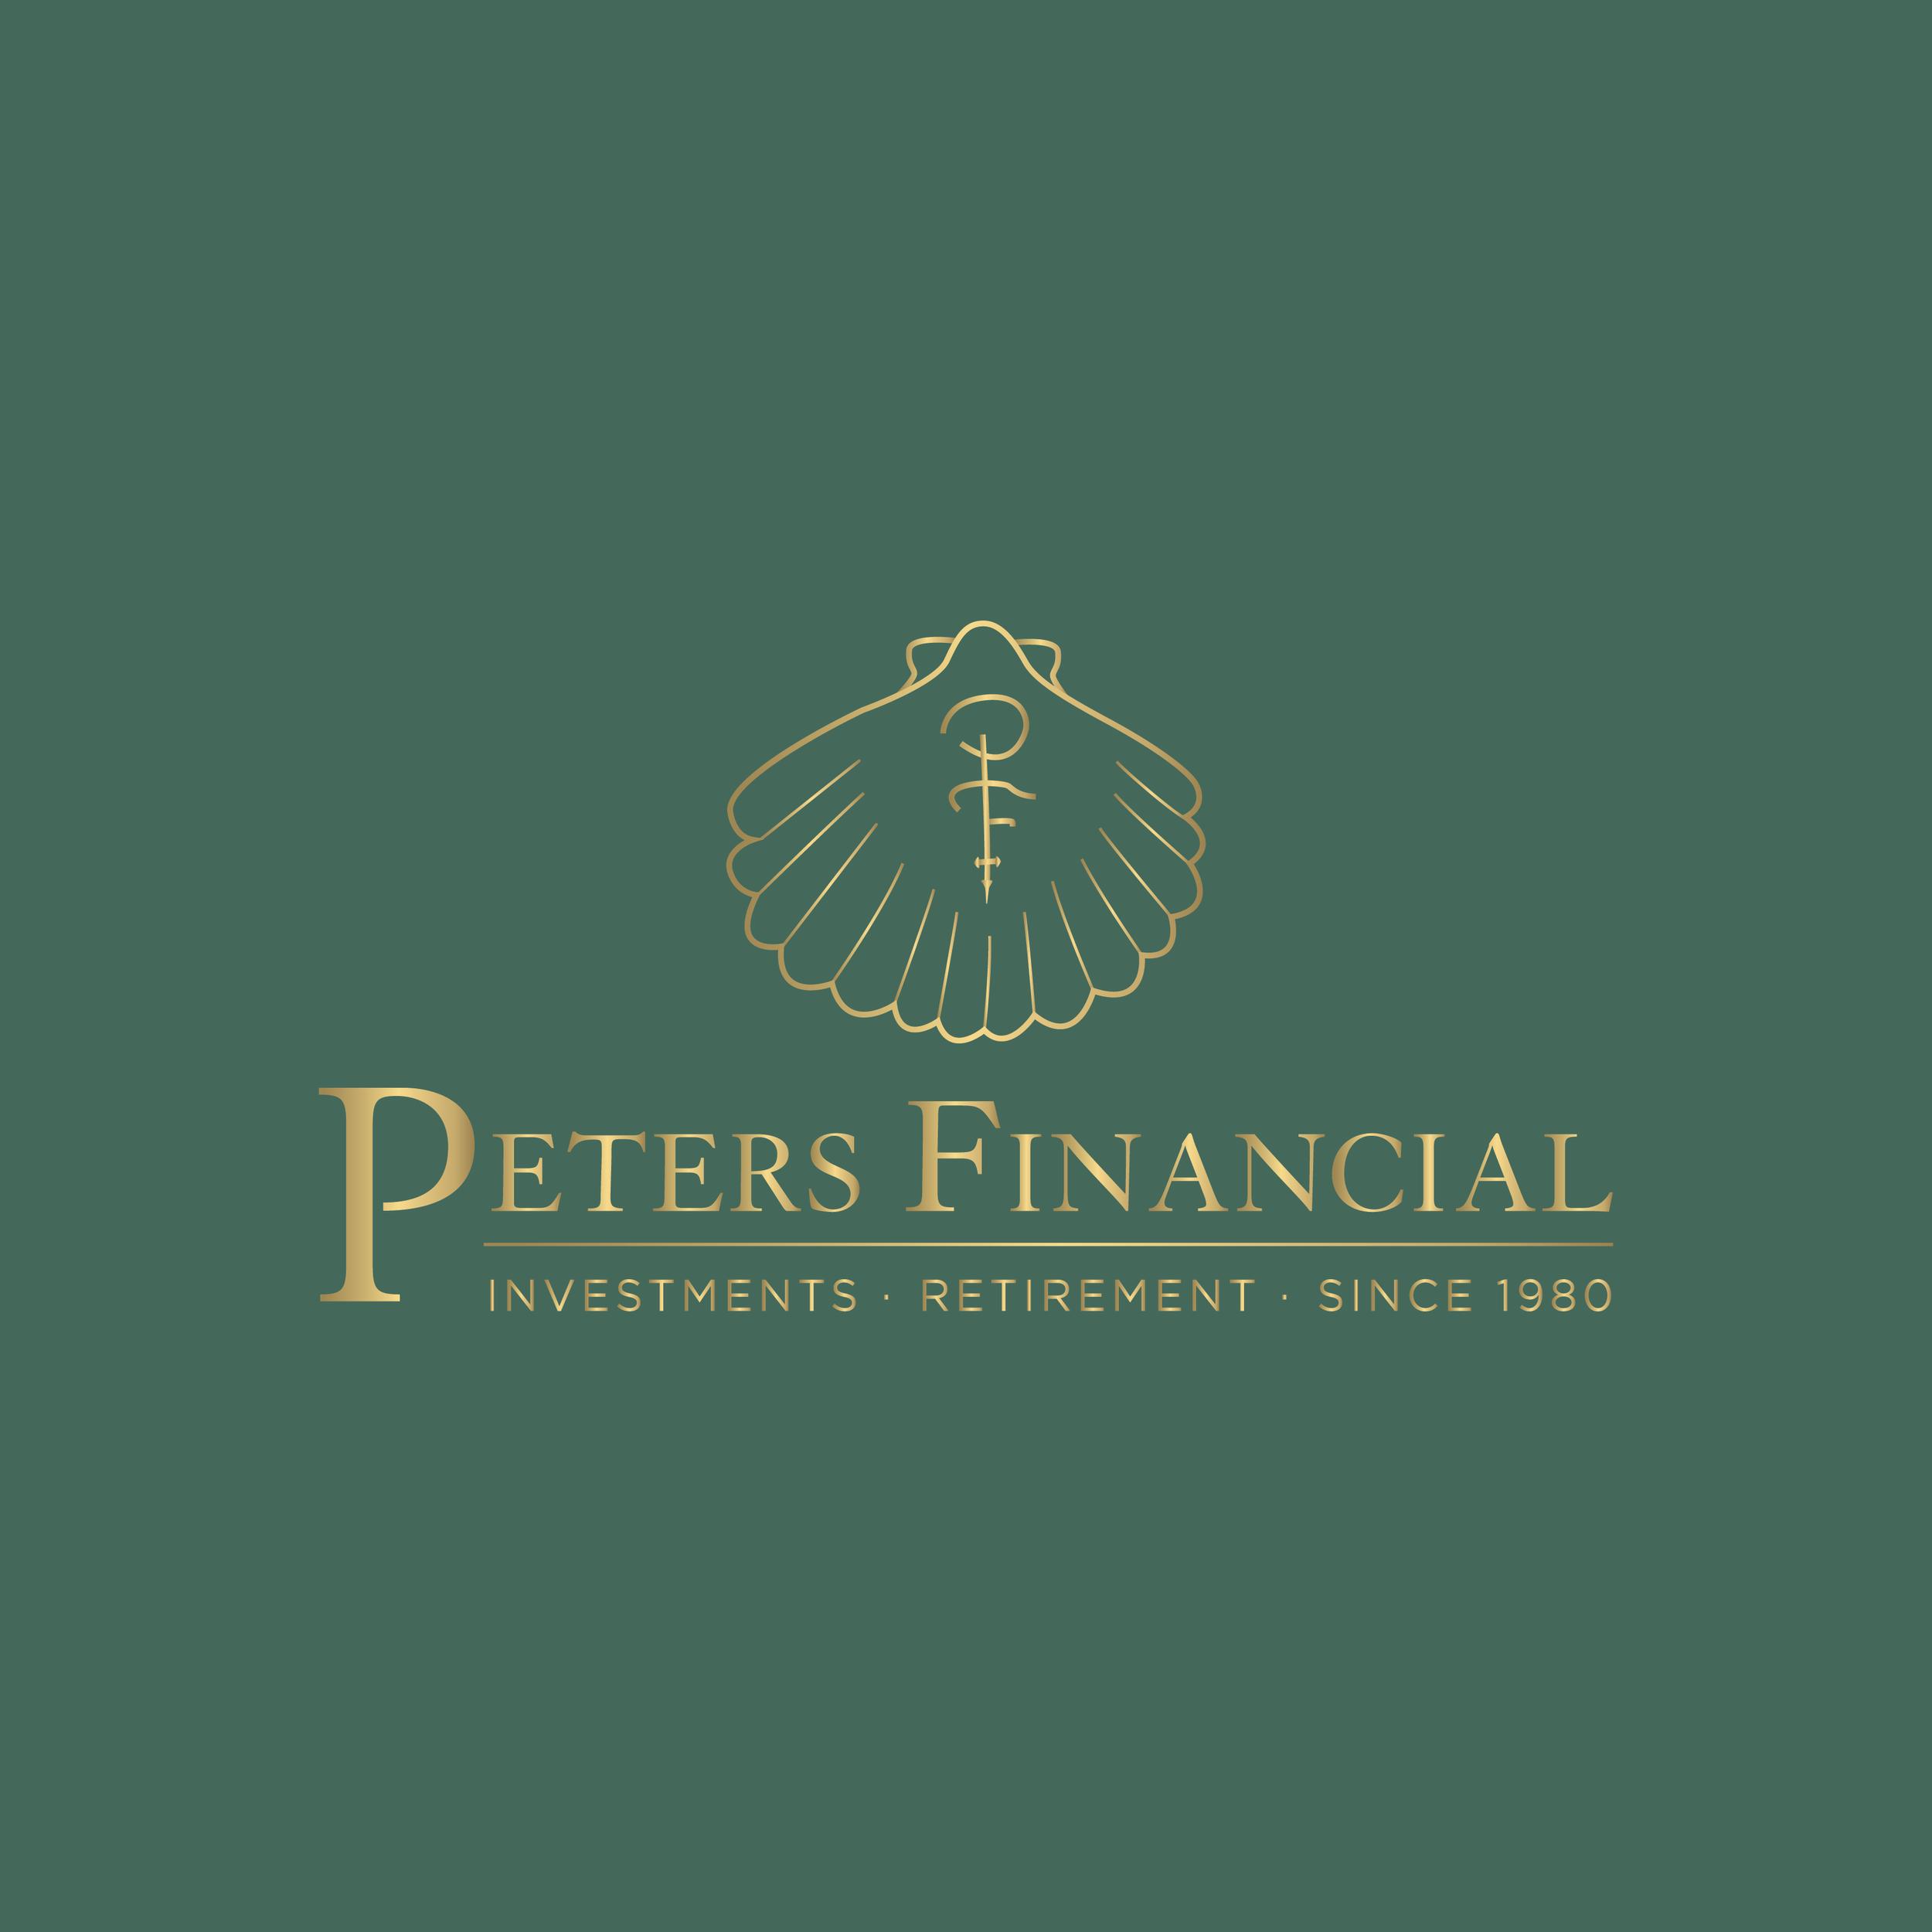 PF_logo_GreenBkgd.png